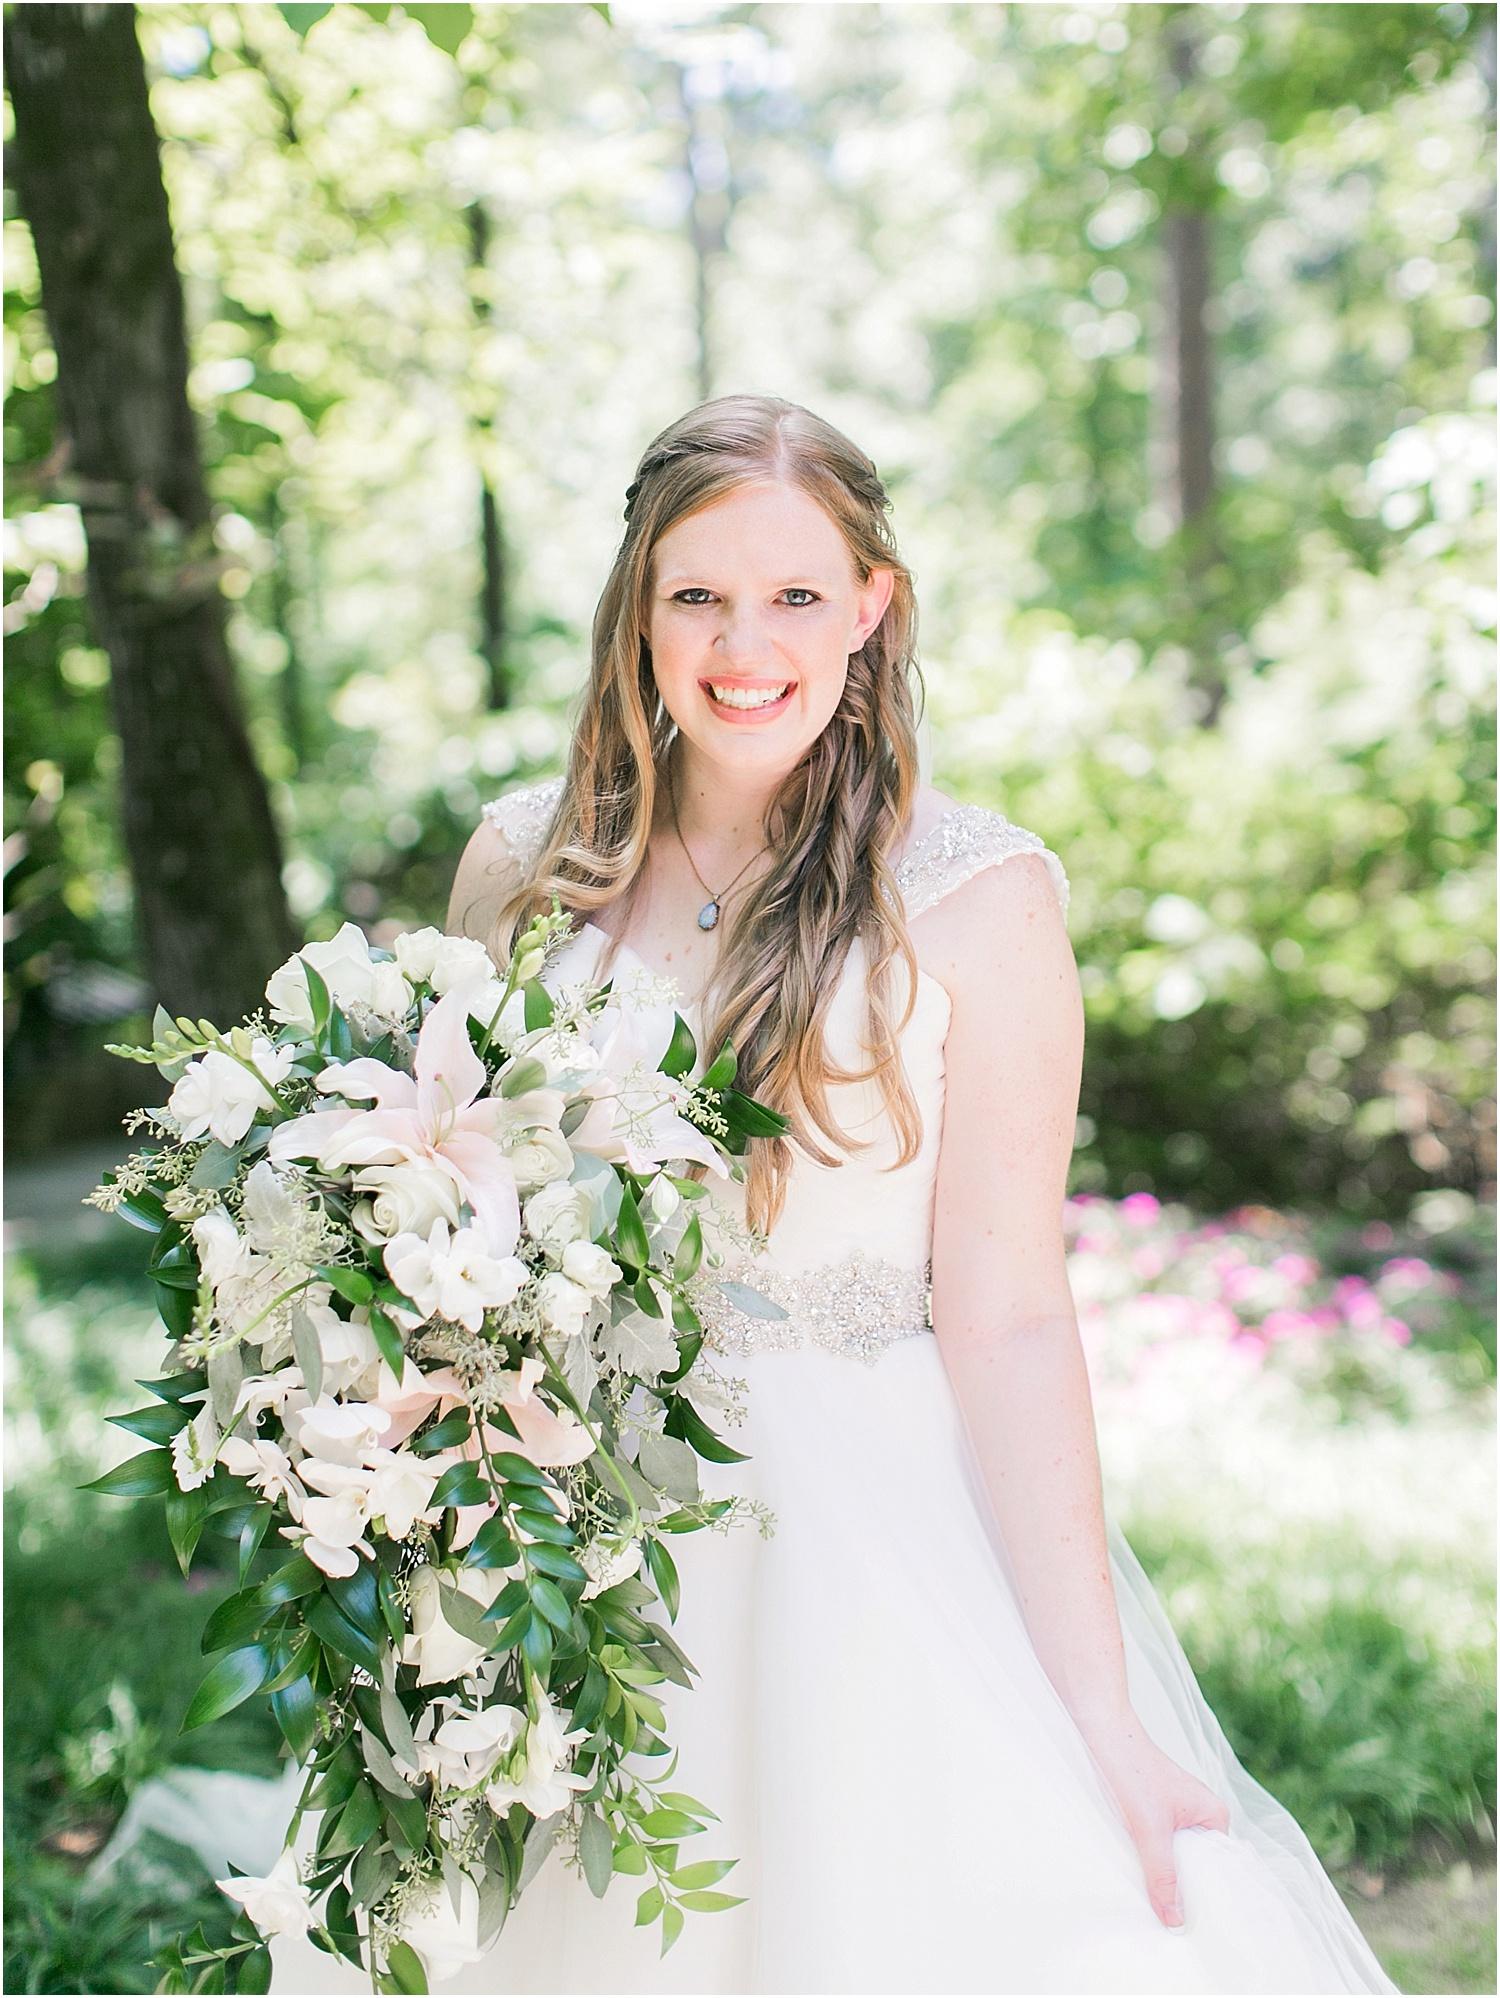 Floral Design by Flowers & Home | Dress & Veil by Norman's Bridal | Garvan Woodland Gardens in Hot Springs, Arkansas